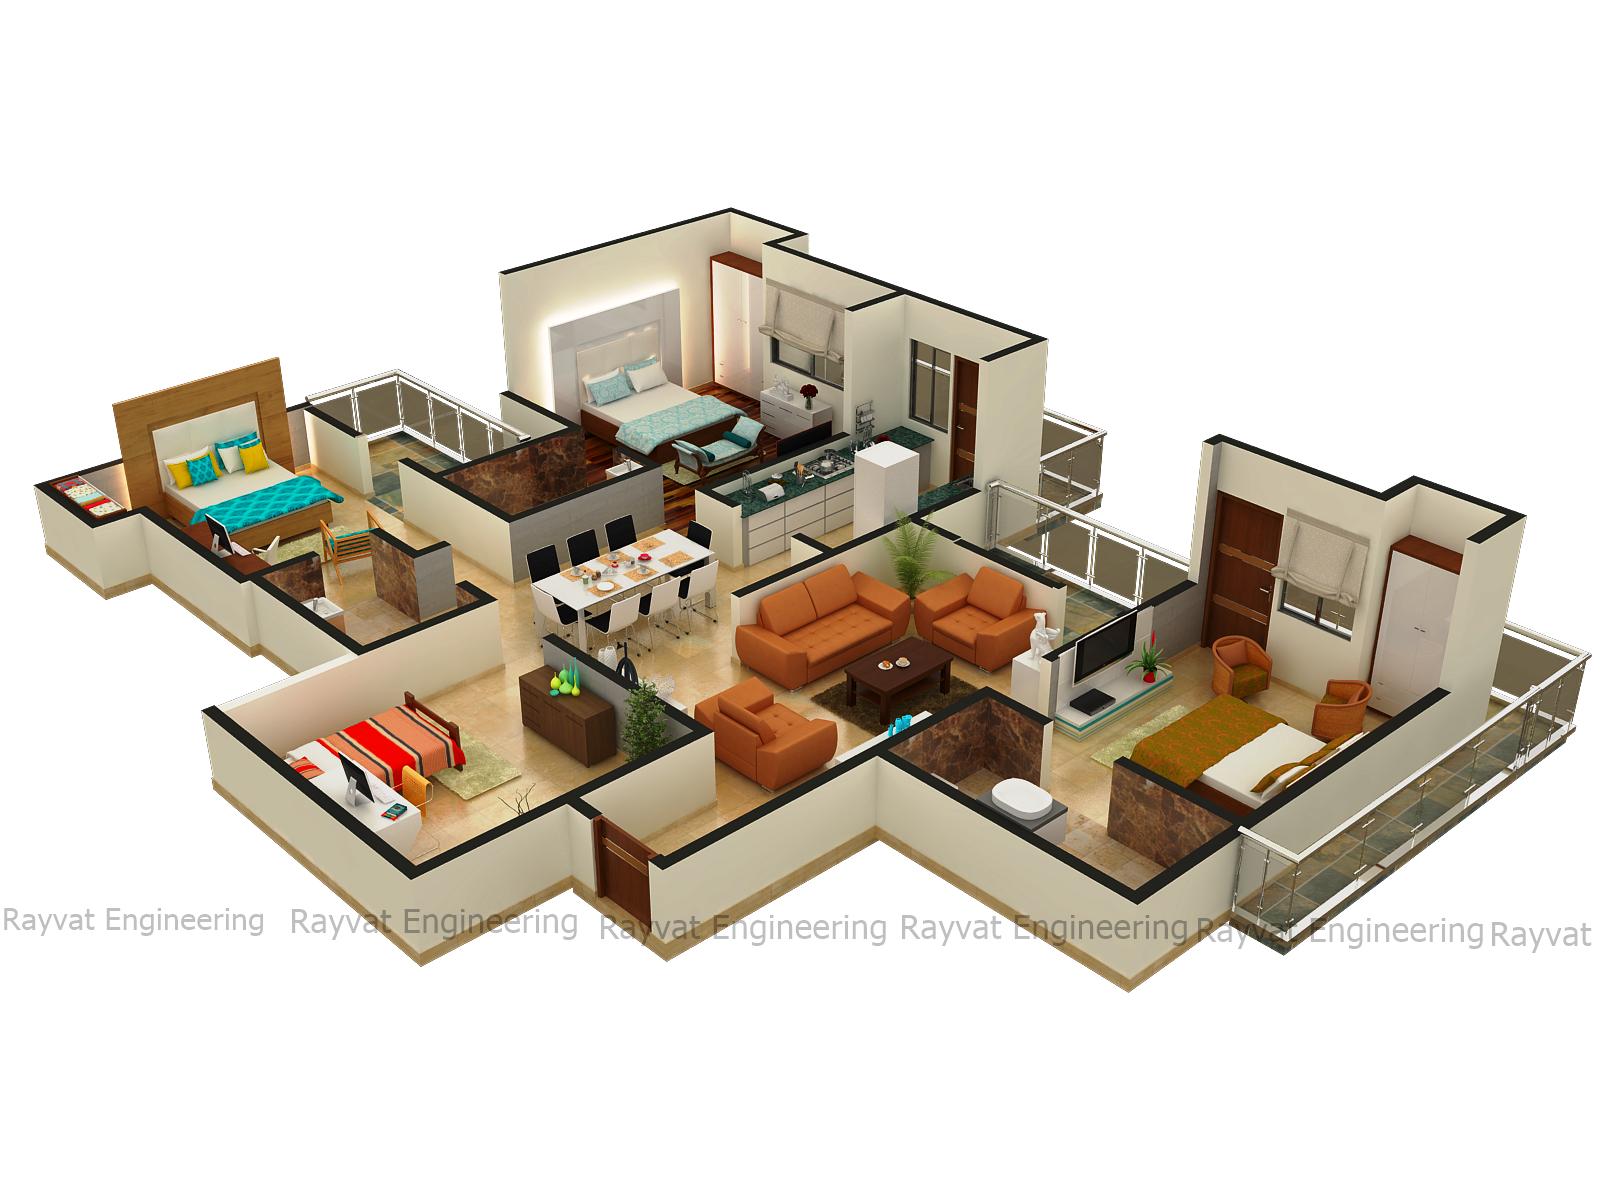 3d Floor Plan Services Architectural 3d Floor Plan Rendering Rendered Floor Plan Floor Plan Layout Floor Plans